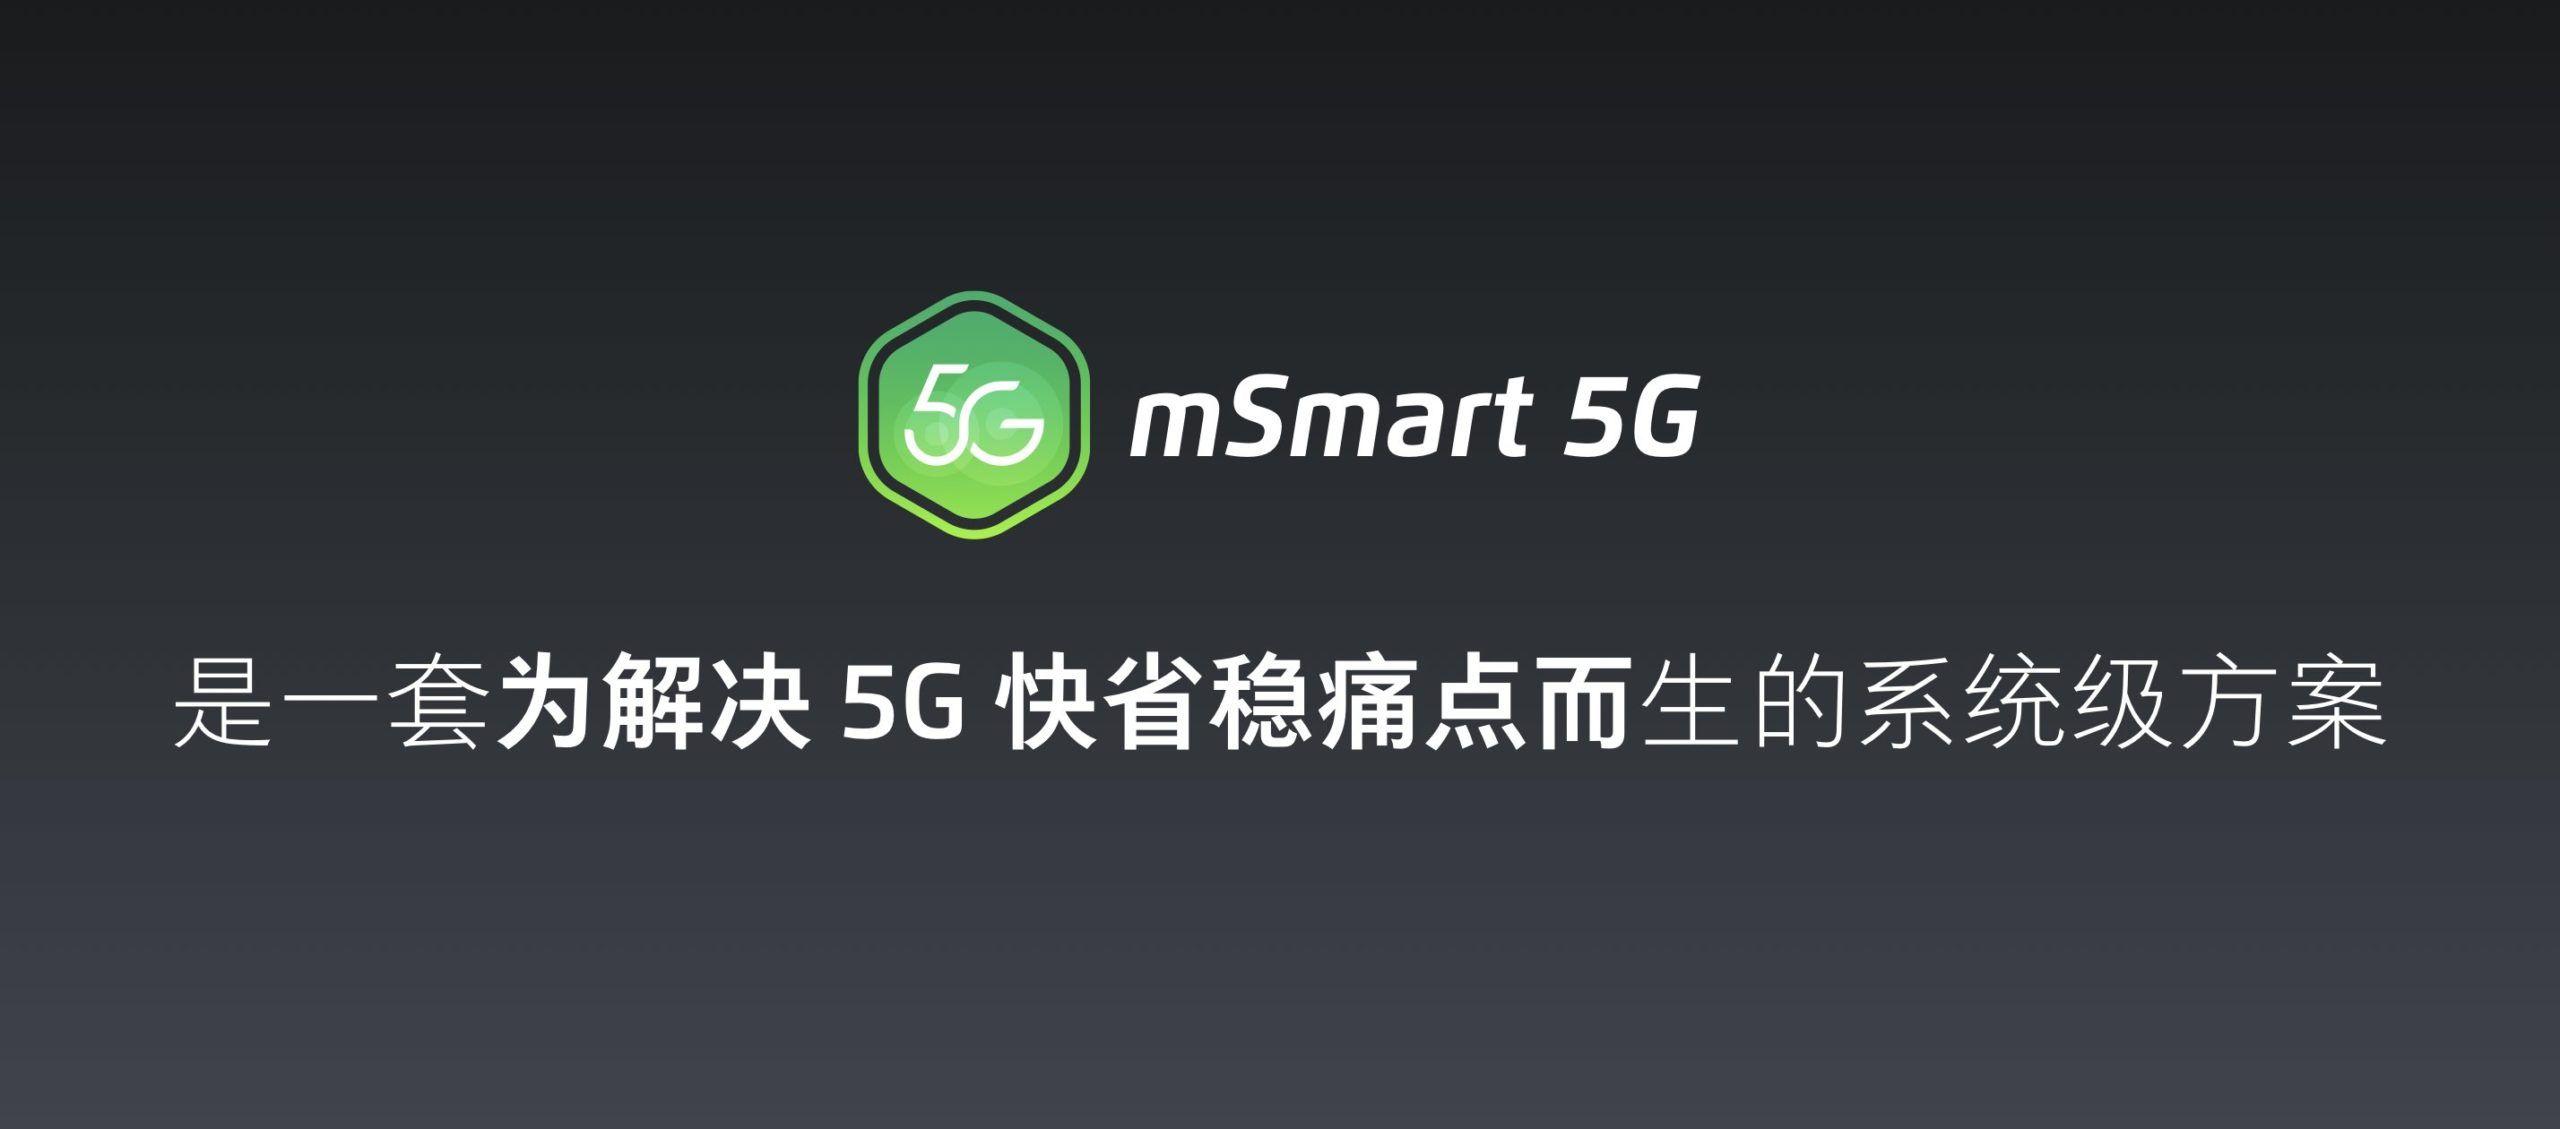 MeizuがmSmart 5G 快省穏技術を発表、より早く・より省電力・より安定に